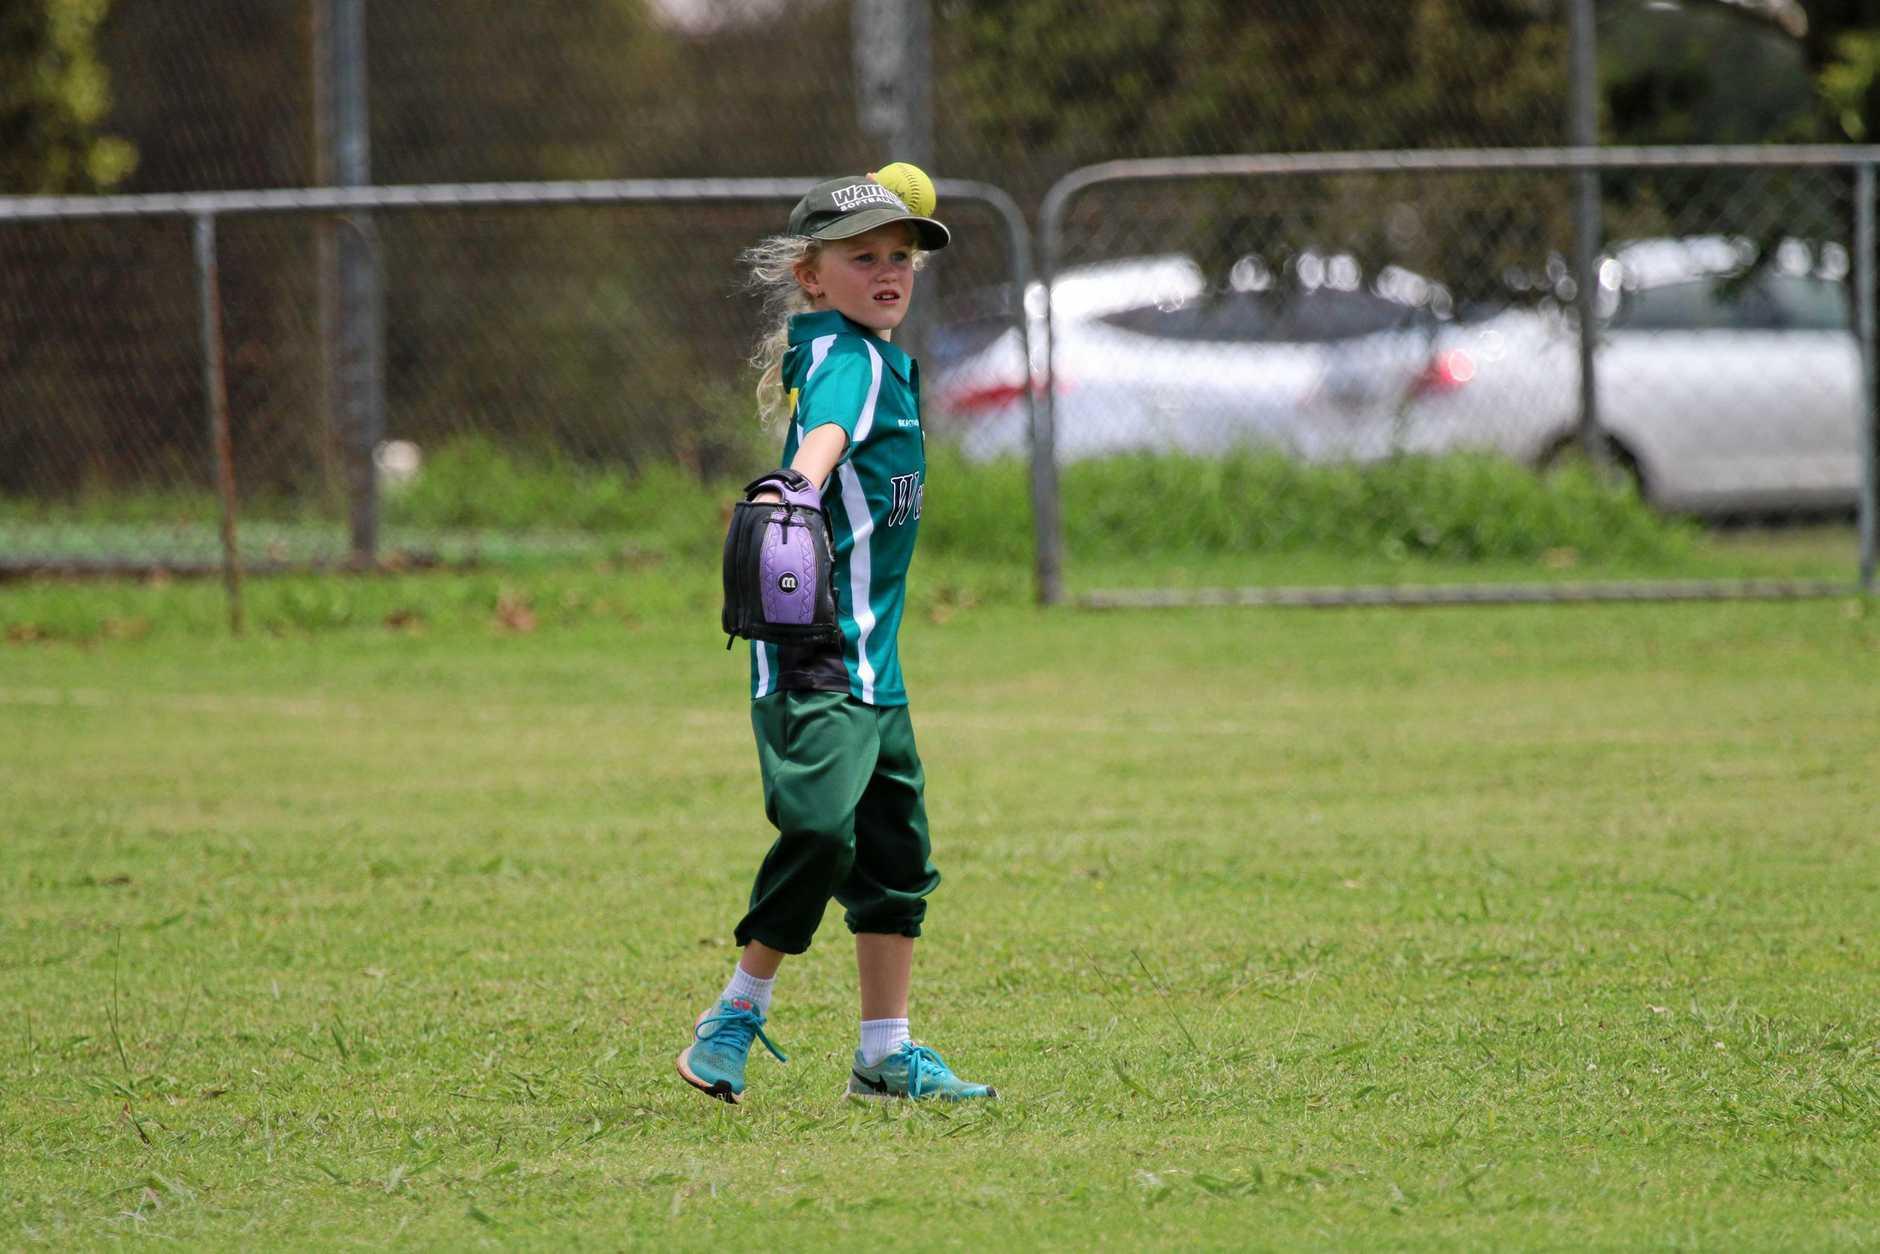 Addison Edards plays for the U9s Warriors Toowoomba Softball team.